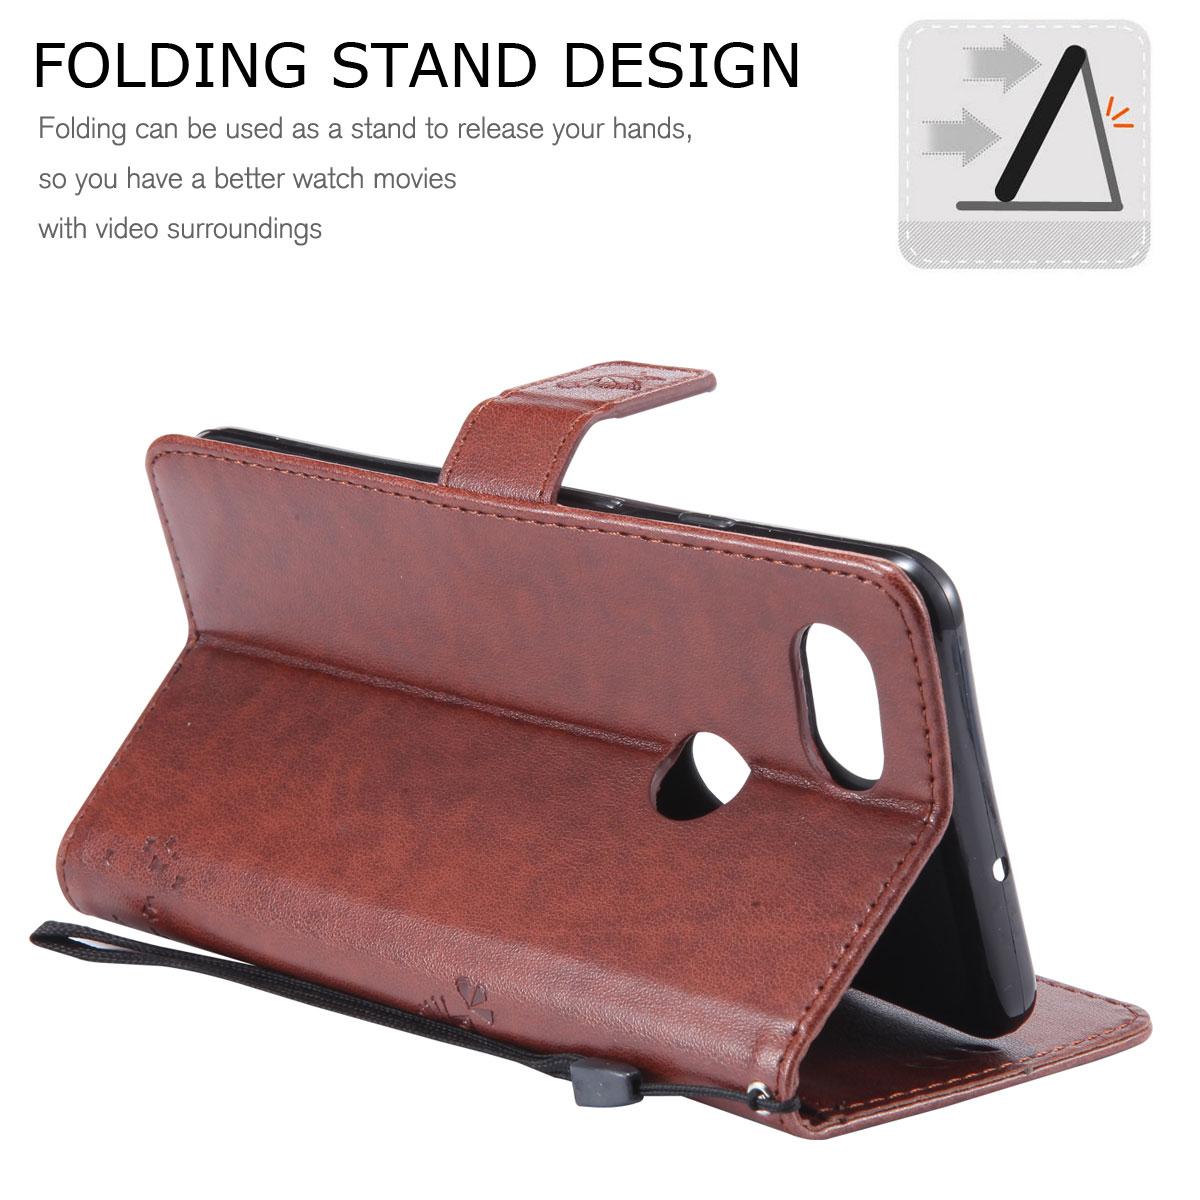 Magnetic-Leather-Credit-Card-Holder-Flip-Case-Cover-For-Google-Pixel-2-2-XL thumbnail 29